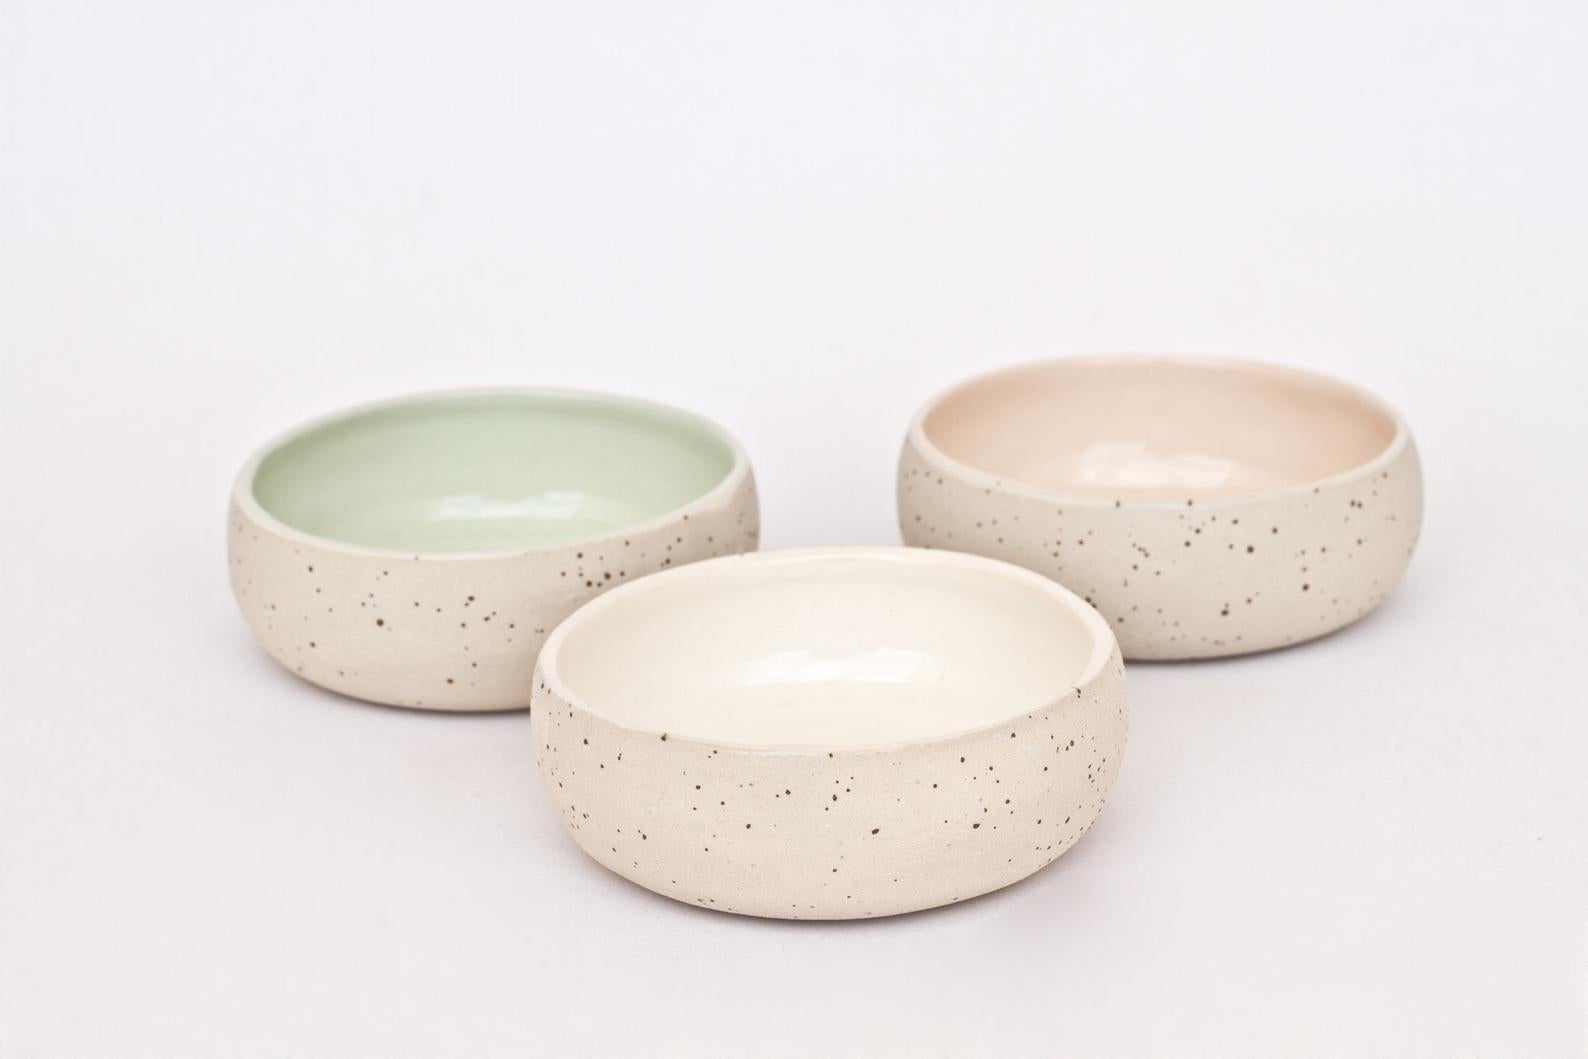 Set of 3 tiny plate bowls